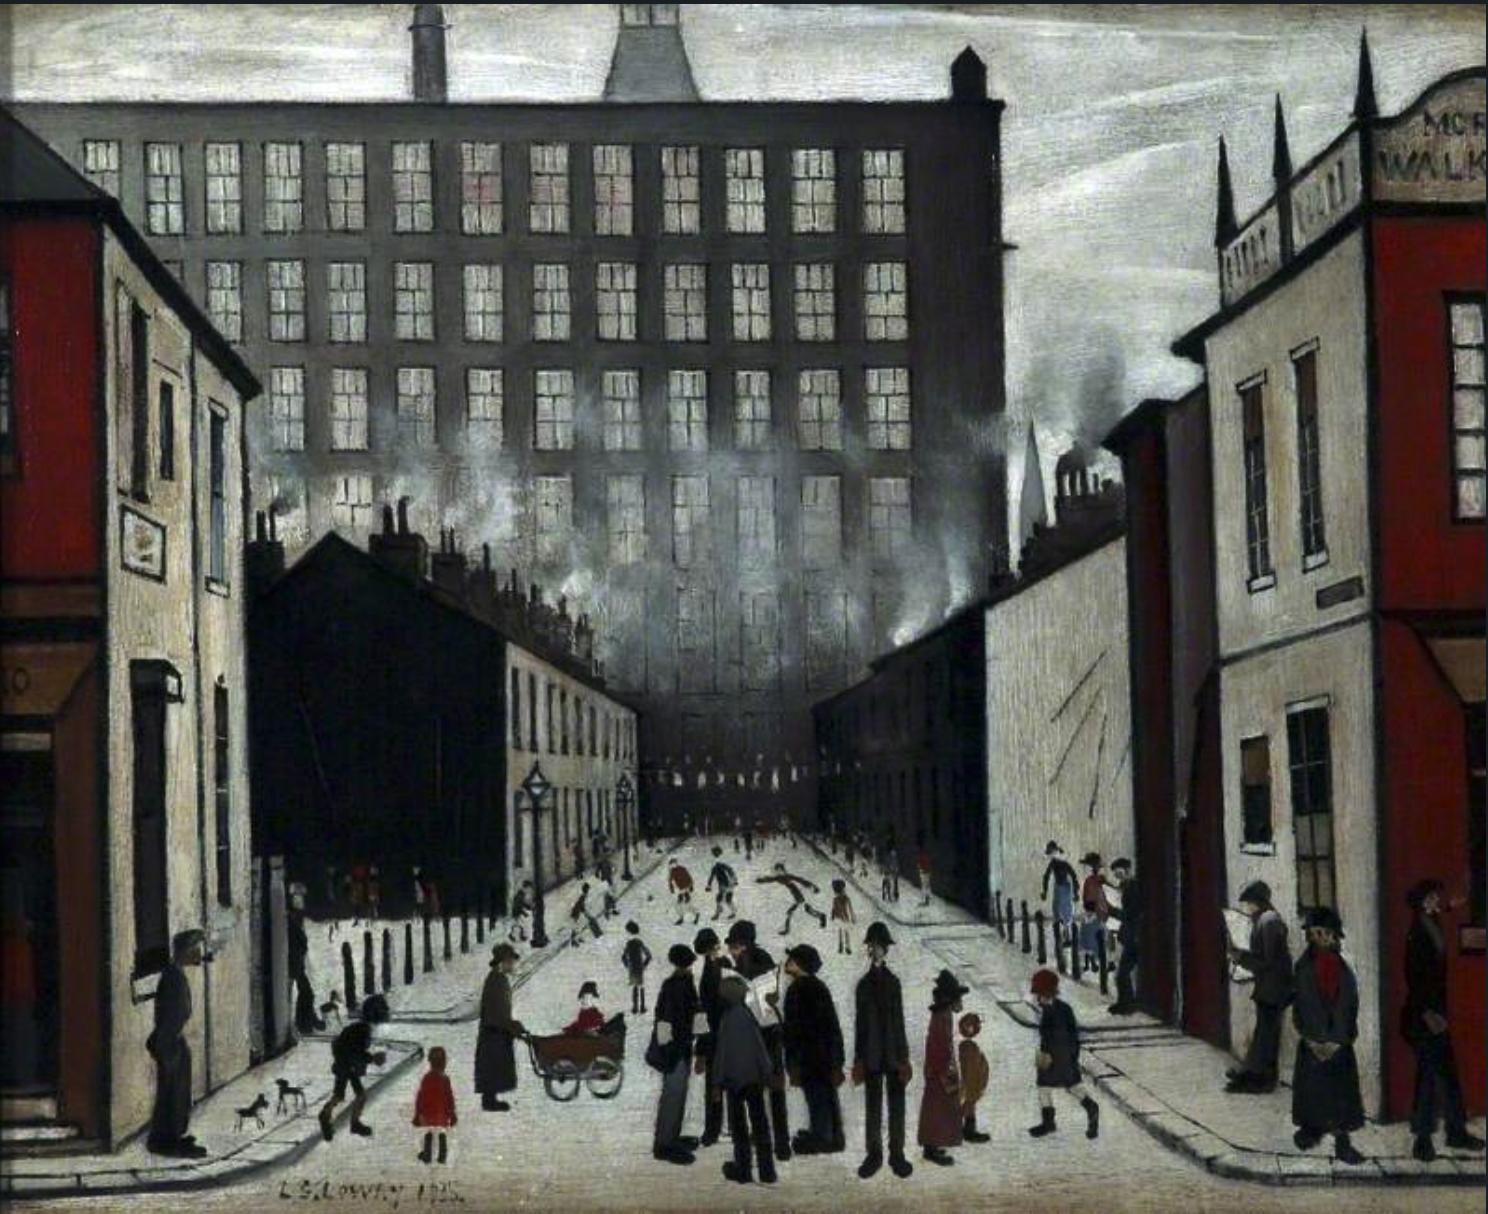 Street Scene (1935 ) by Laurence Stephen Lowry (1887 - 1976), English artist.